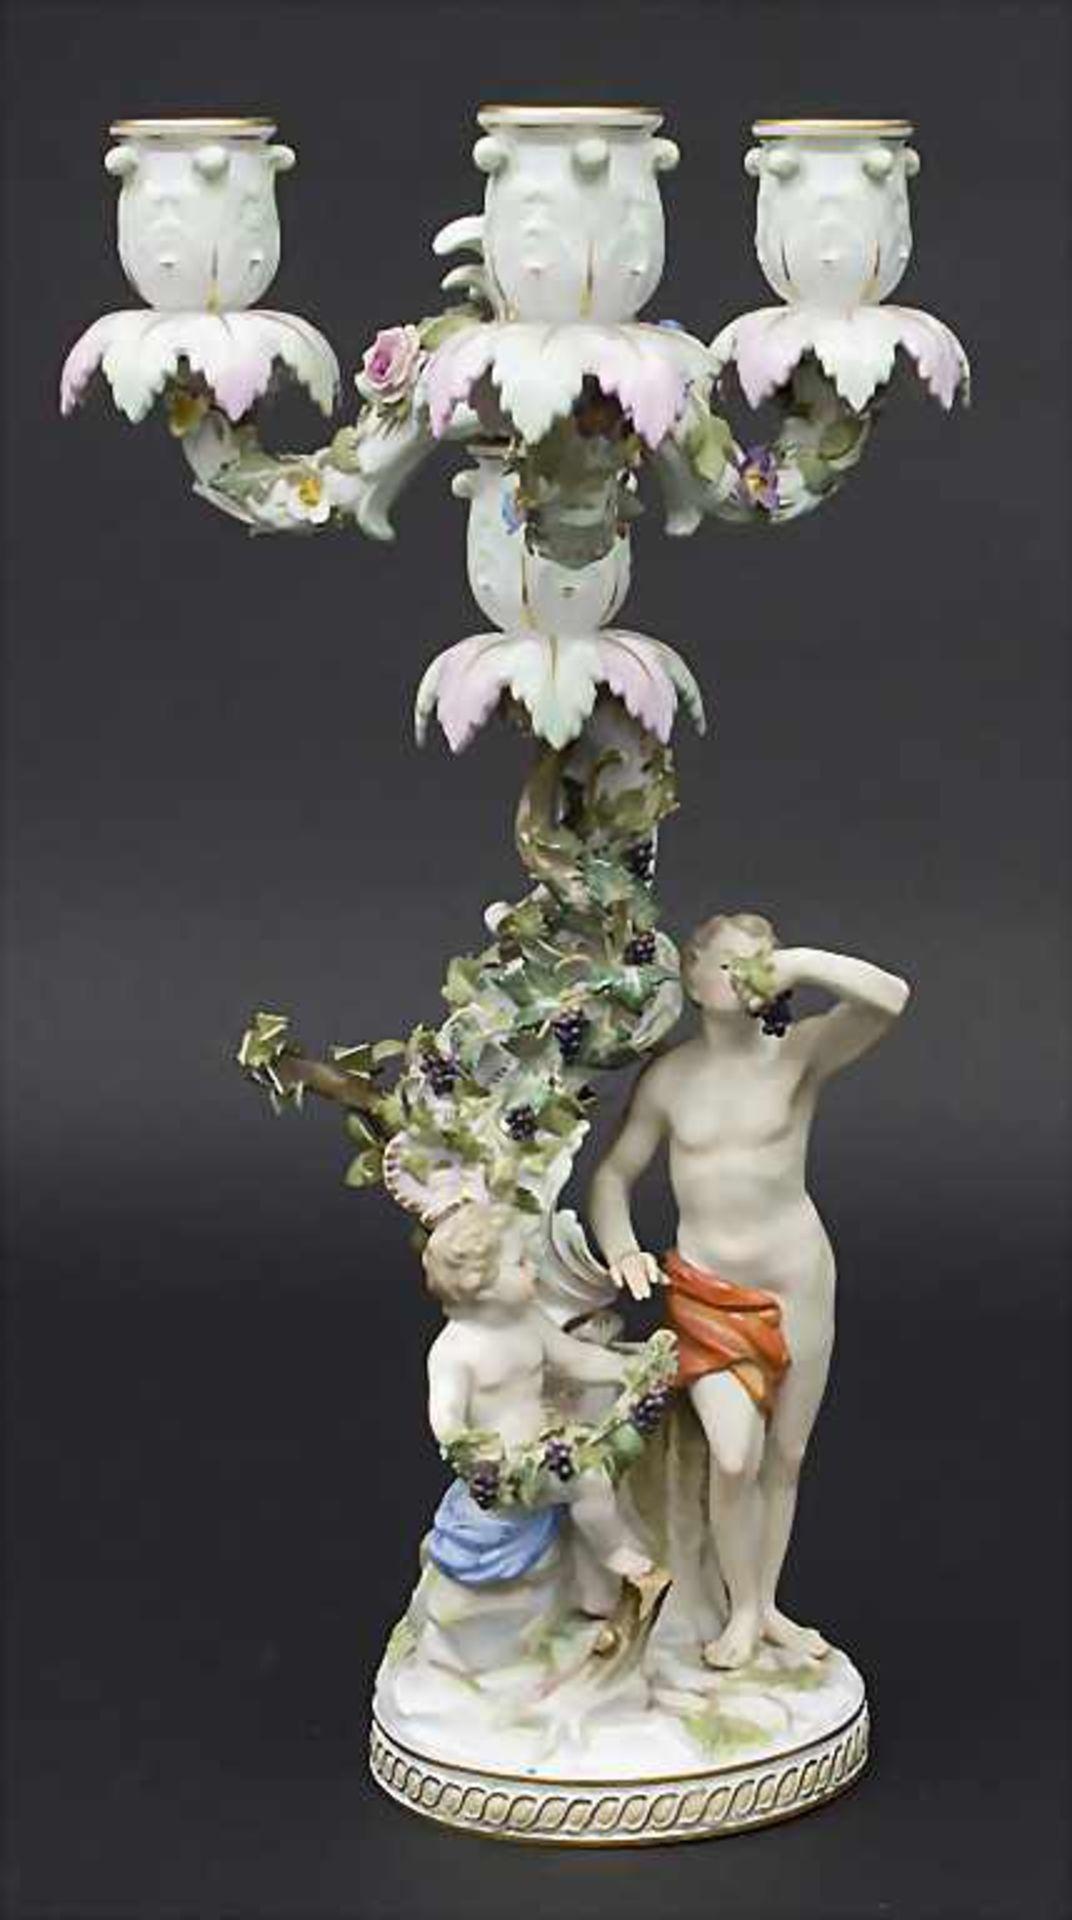 Dreiflammiger Leuchter Allegorie 'Der Herbst' / An allegorical candleholder 'The Autumn', Meissen,